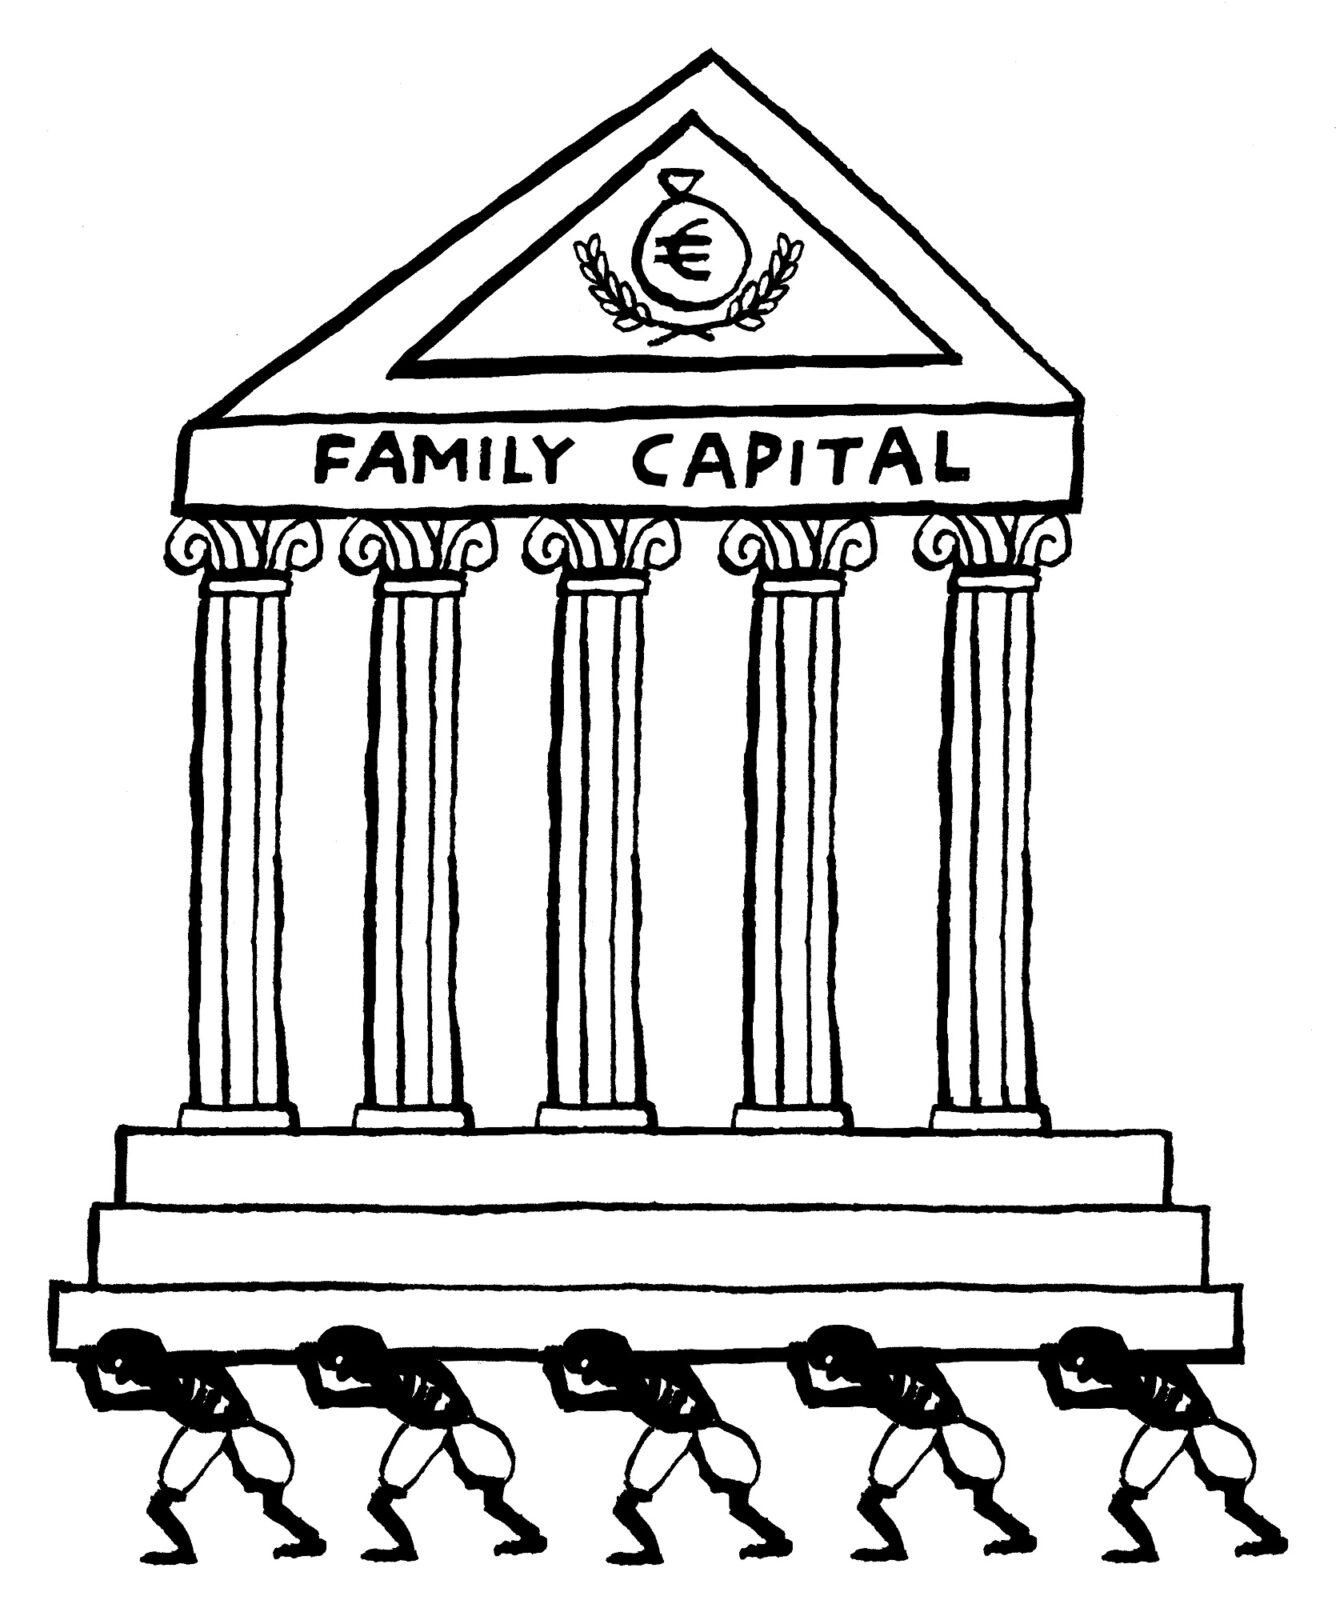 em-familie kapitaal slavernij-eng